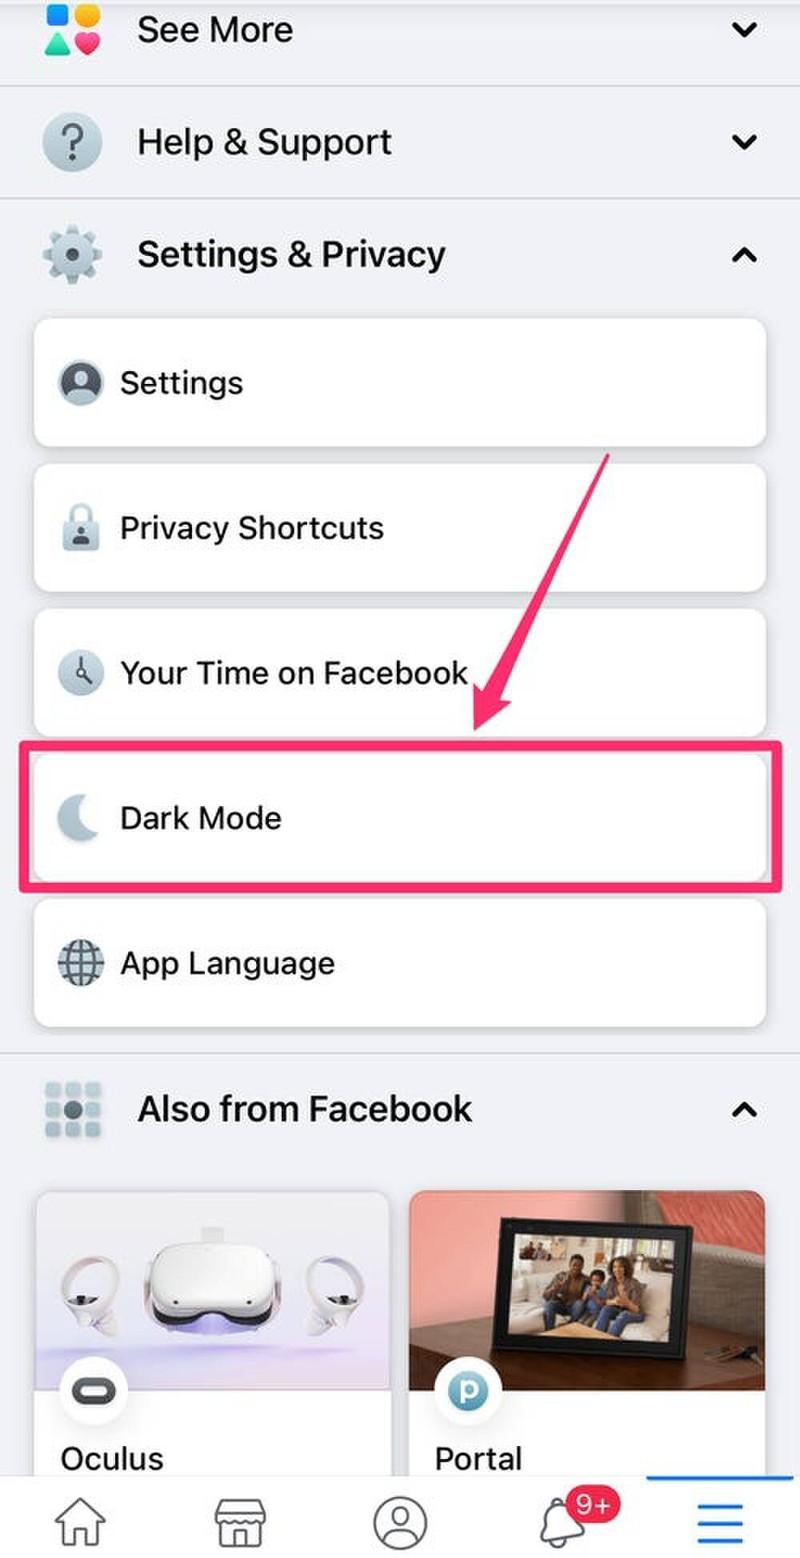 Cach mo che do Dark Mode cua Facebook tren tat ca cac thiet bi-Hinh-3